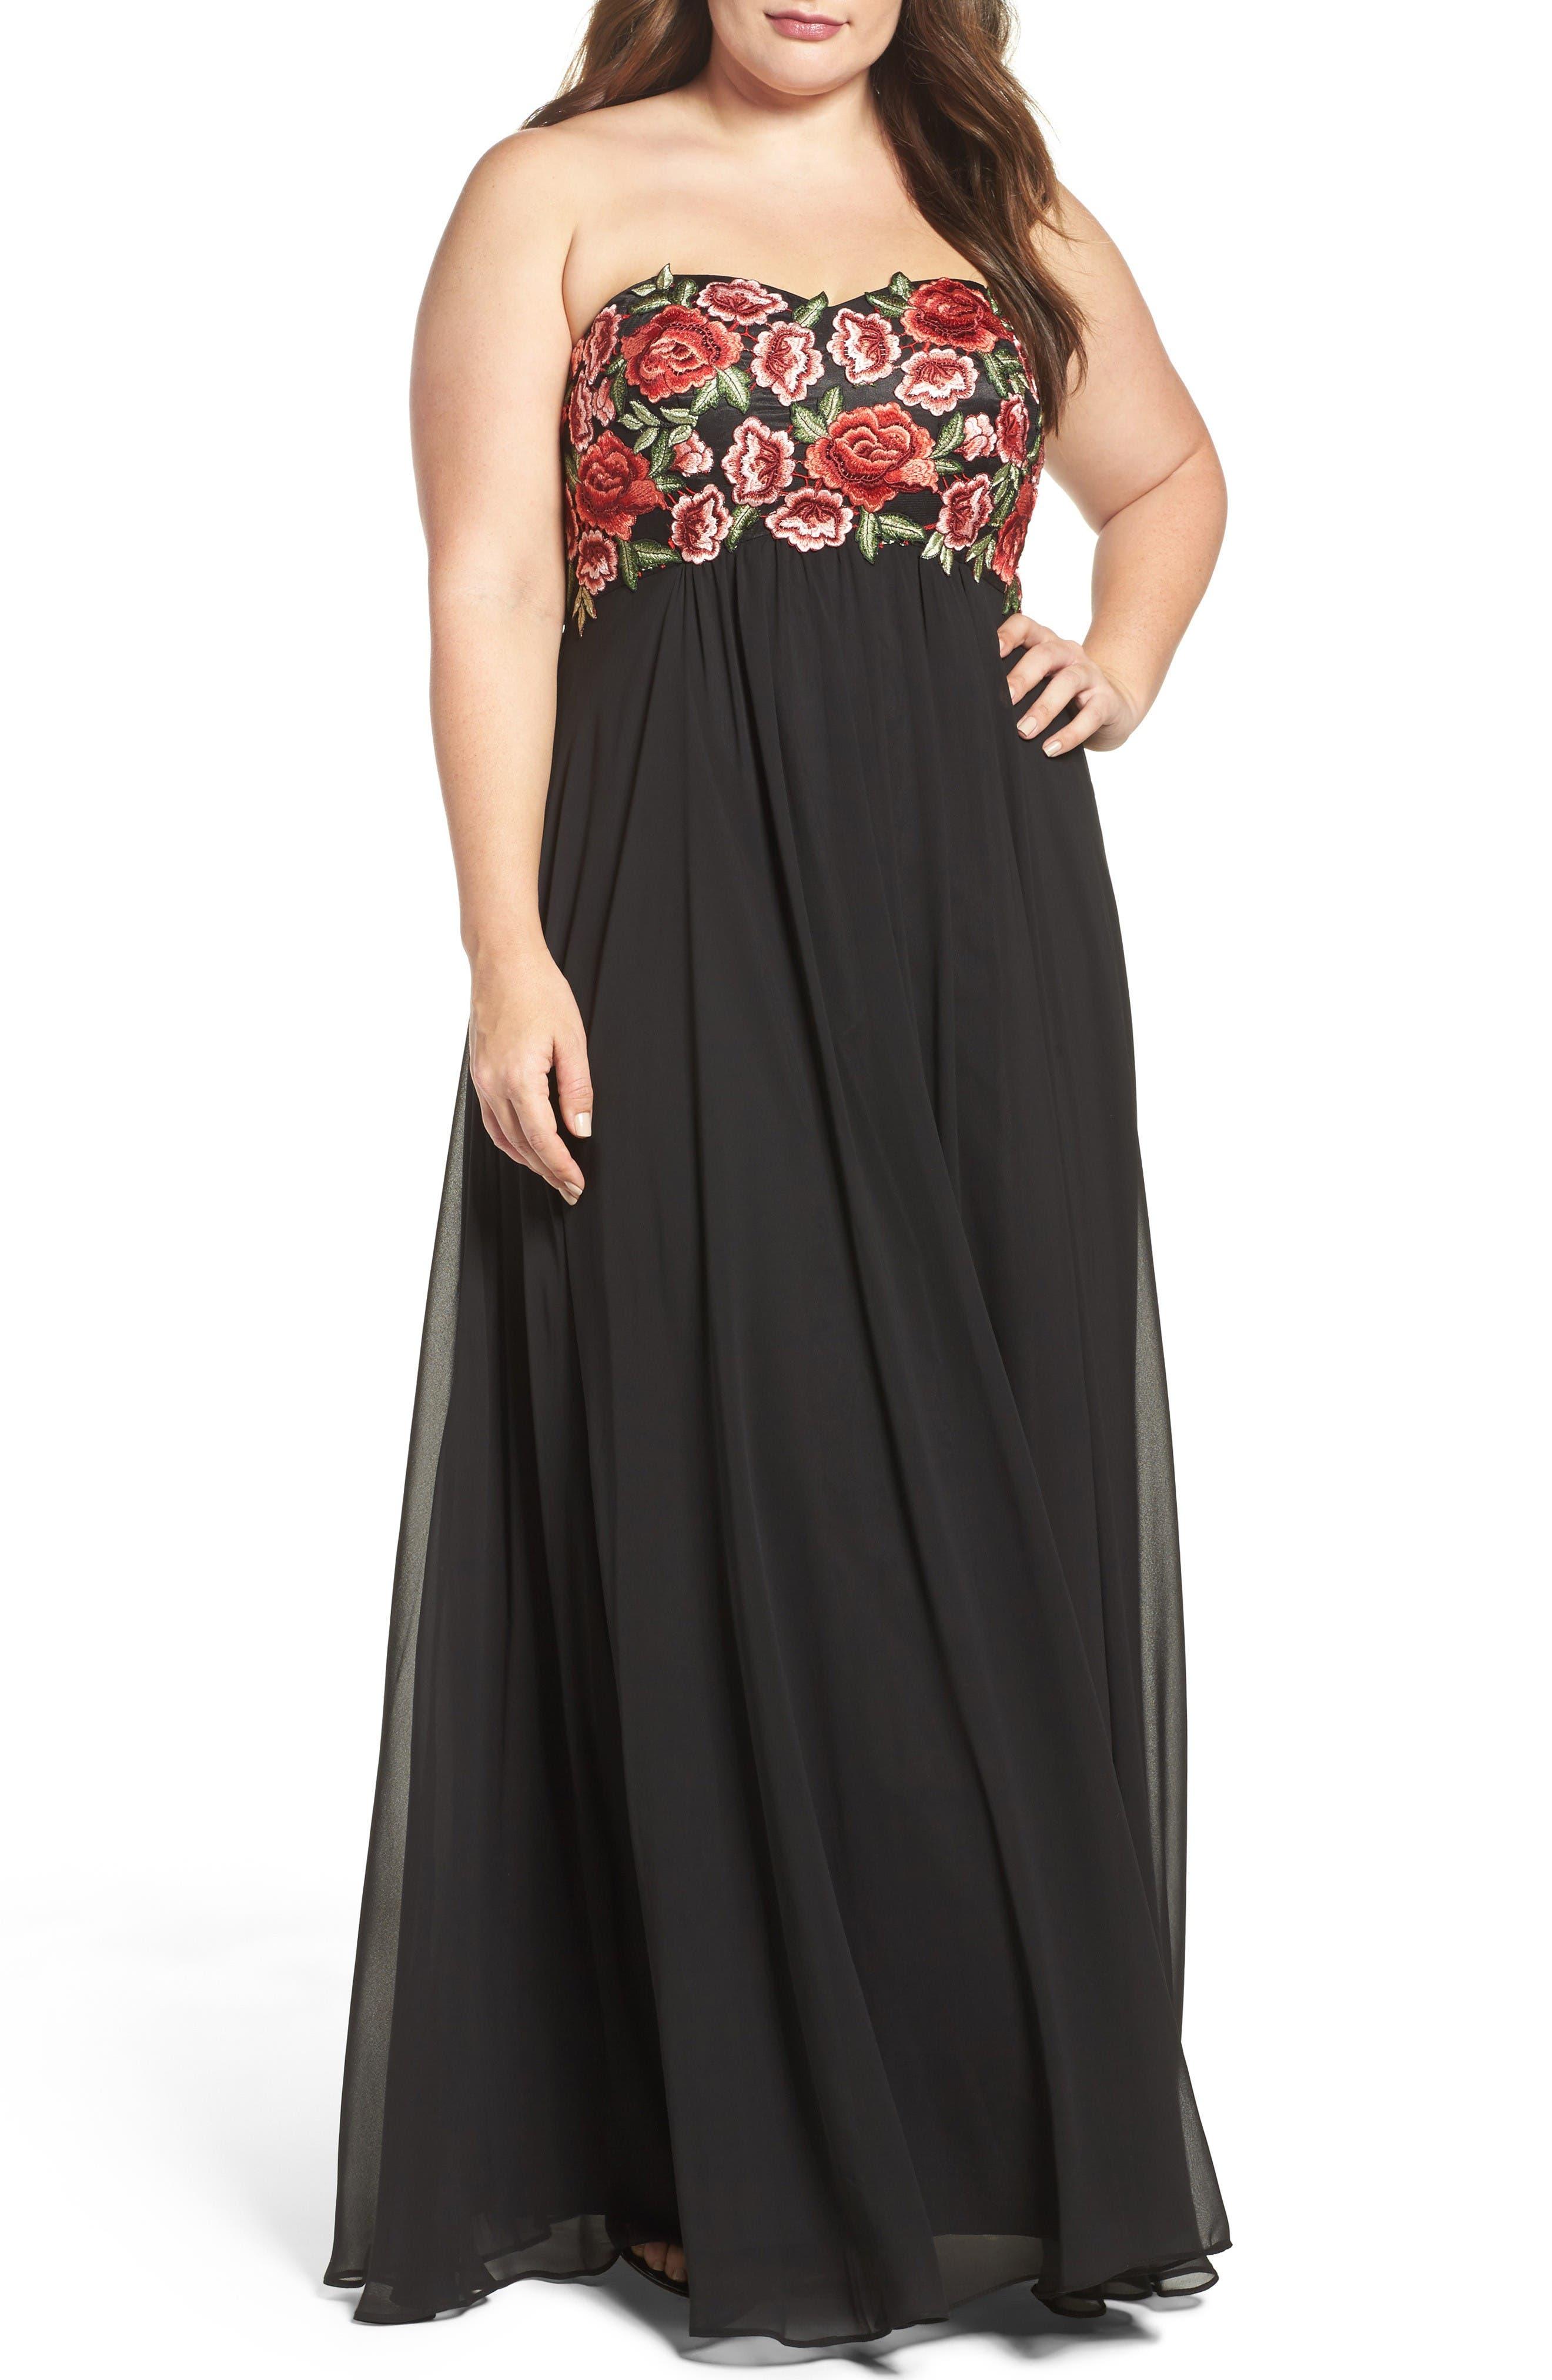 Floral Appliqué Strapless Gown,                         Main,                         color, Black/ Red